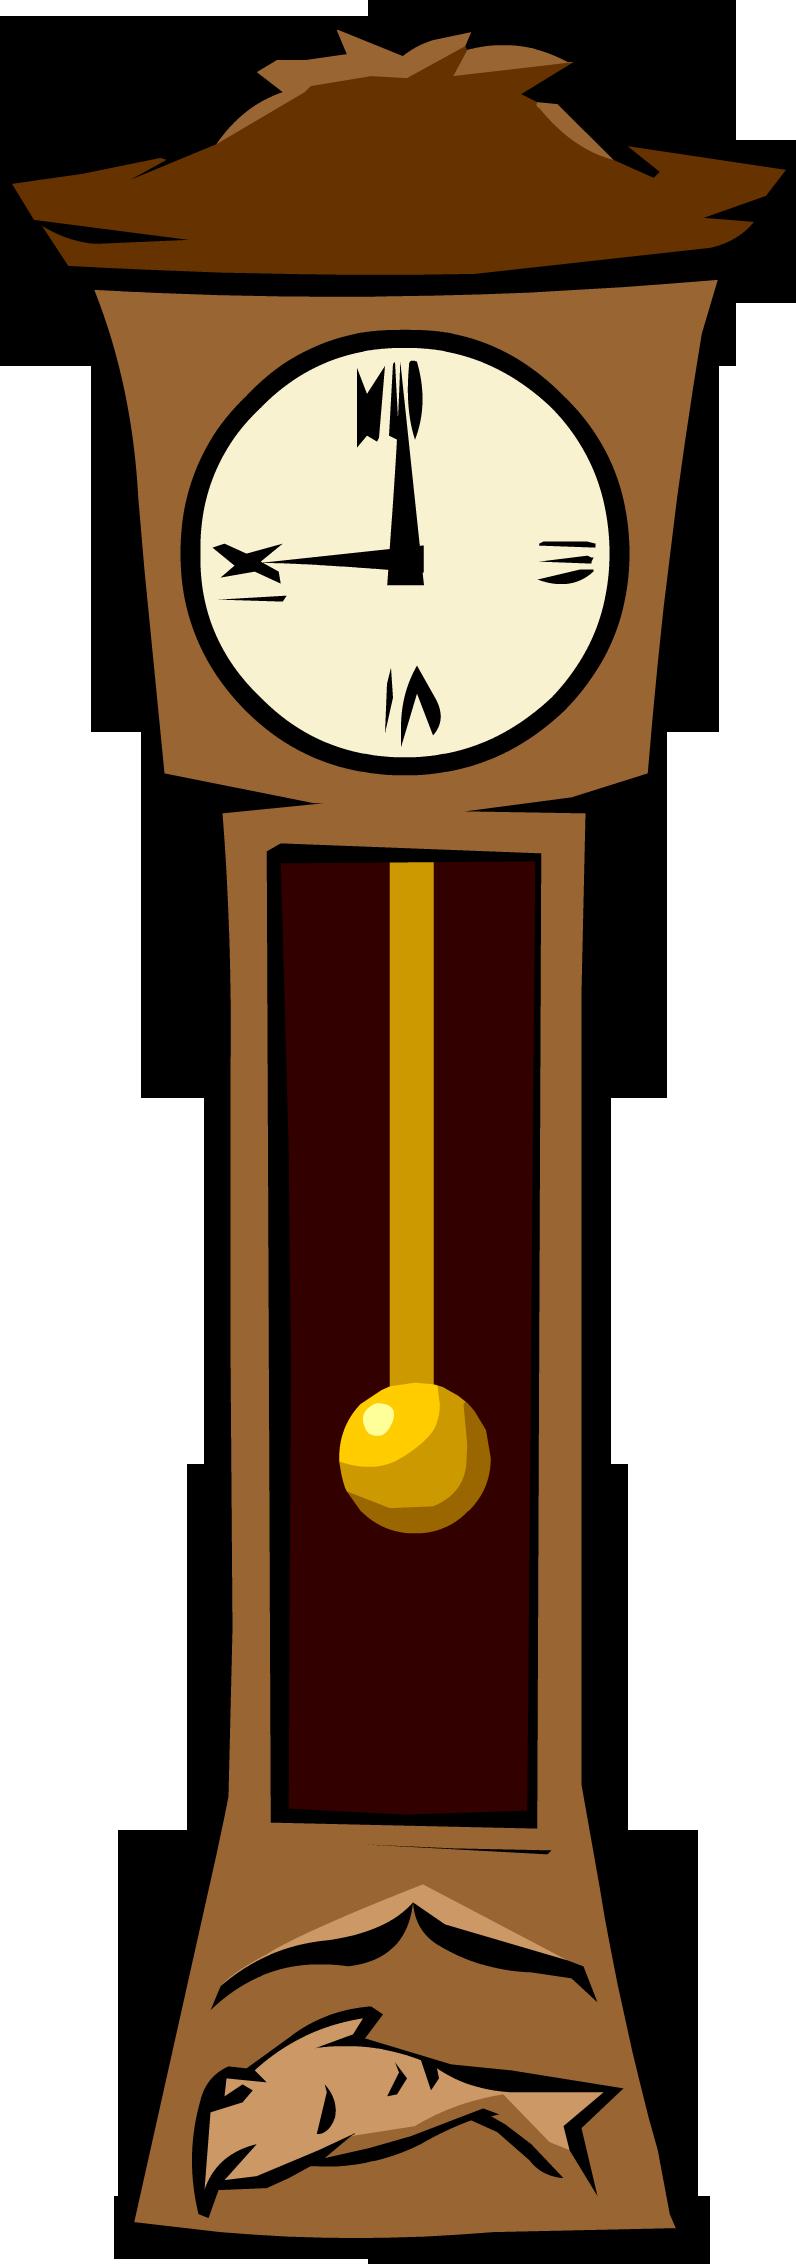 Clocks clipart baby. Grandfather clock yahoo search